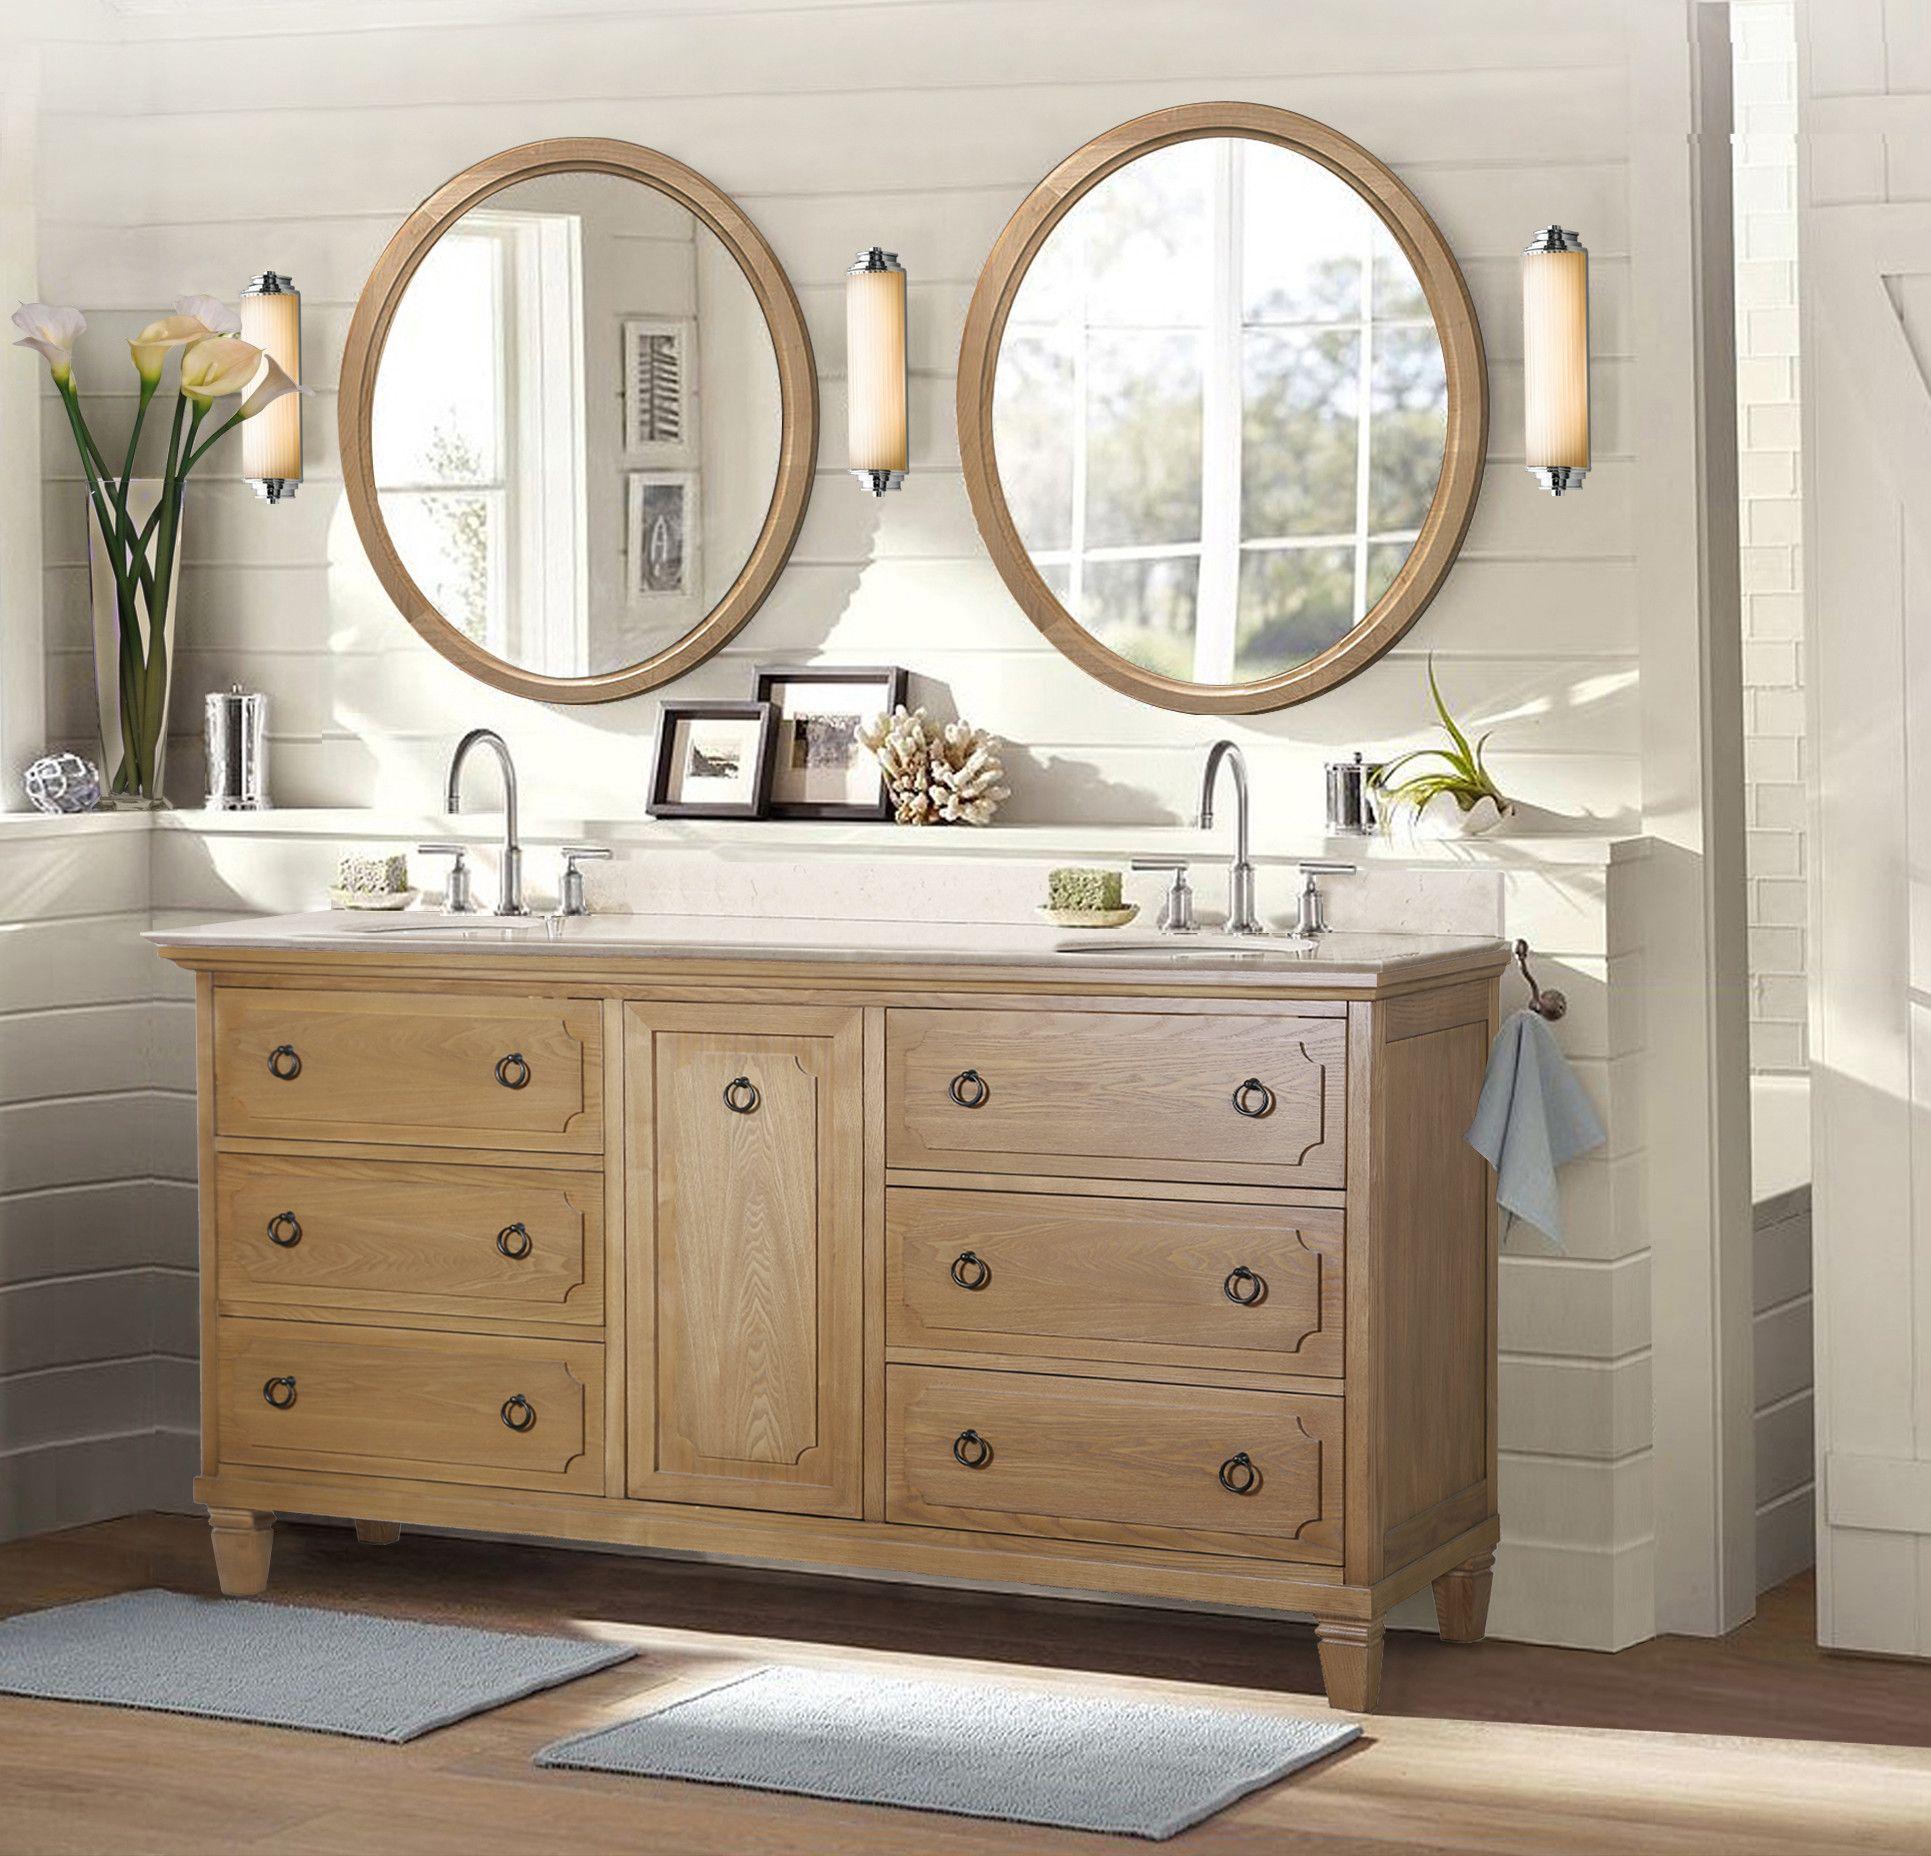 vanities wall wood grain shop hung black vanity ibiza bathroom timber linewood double